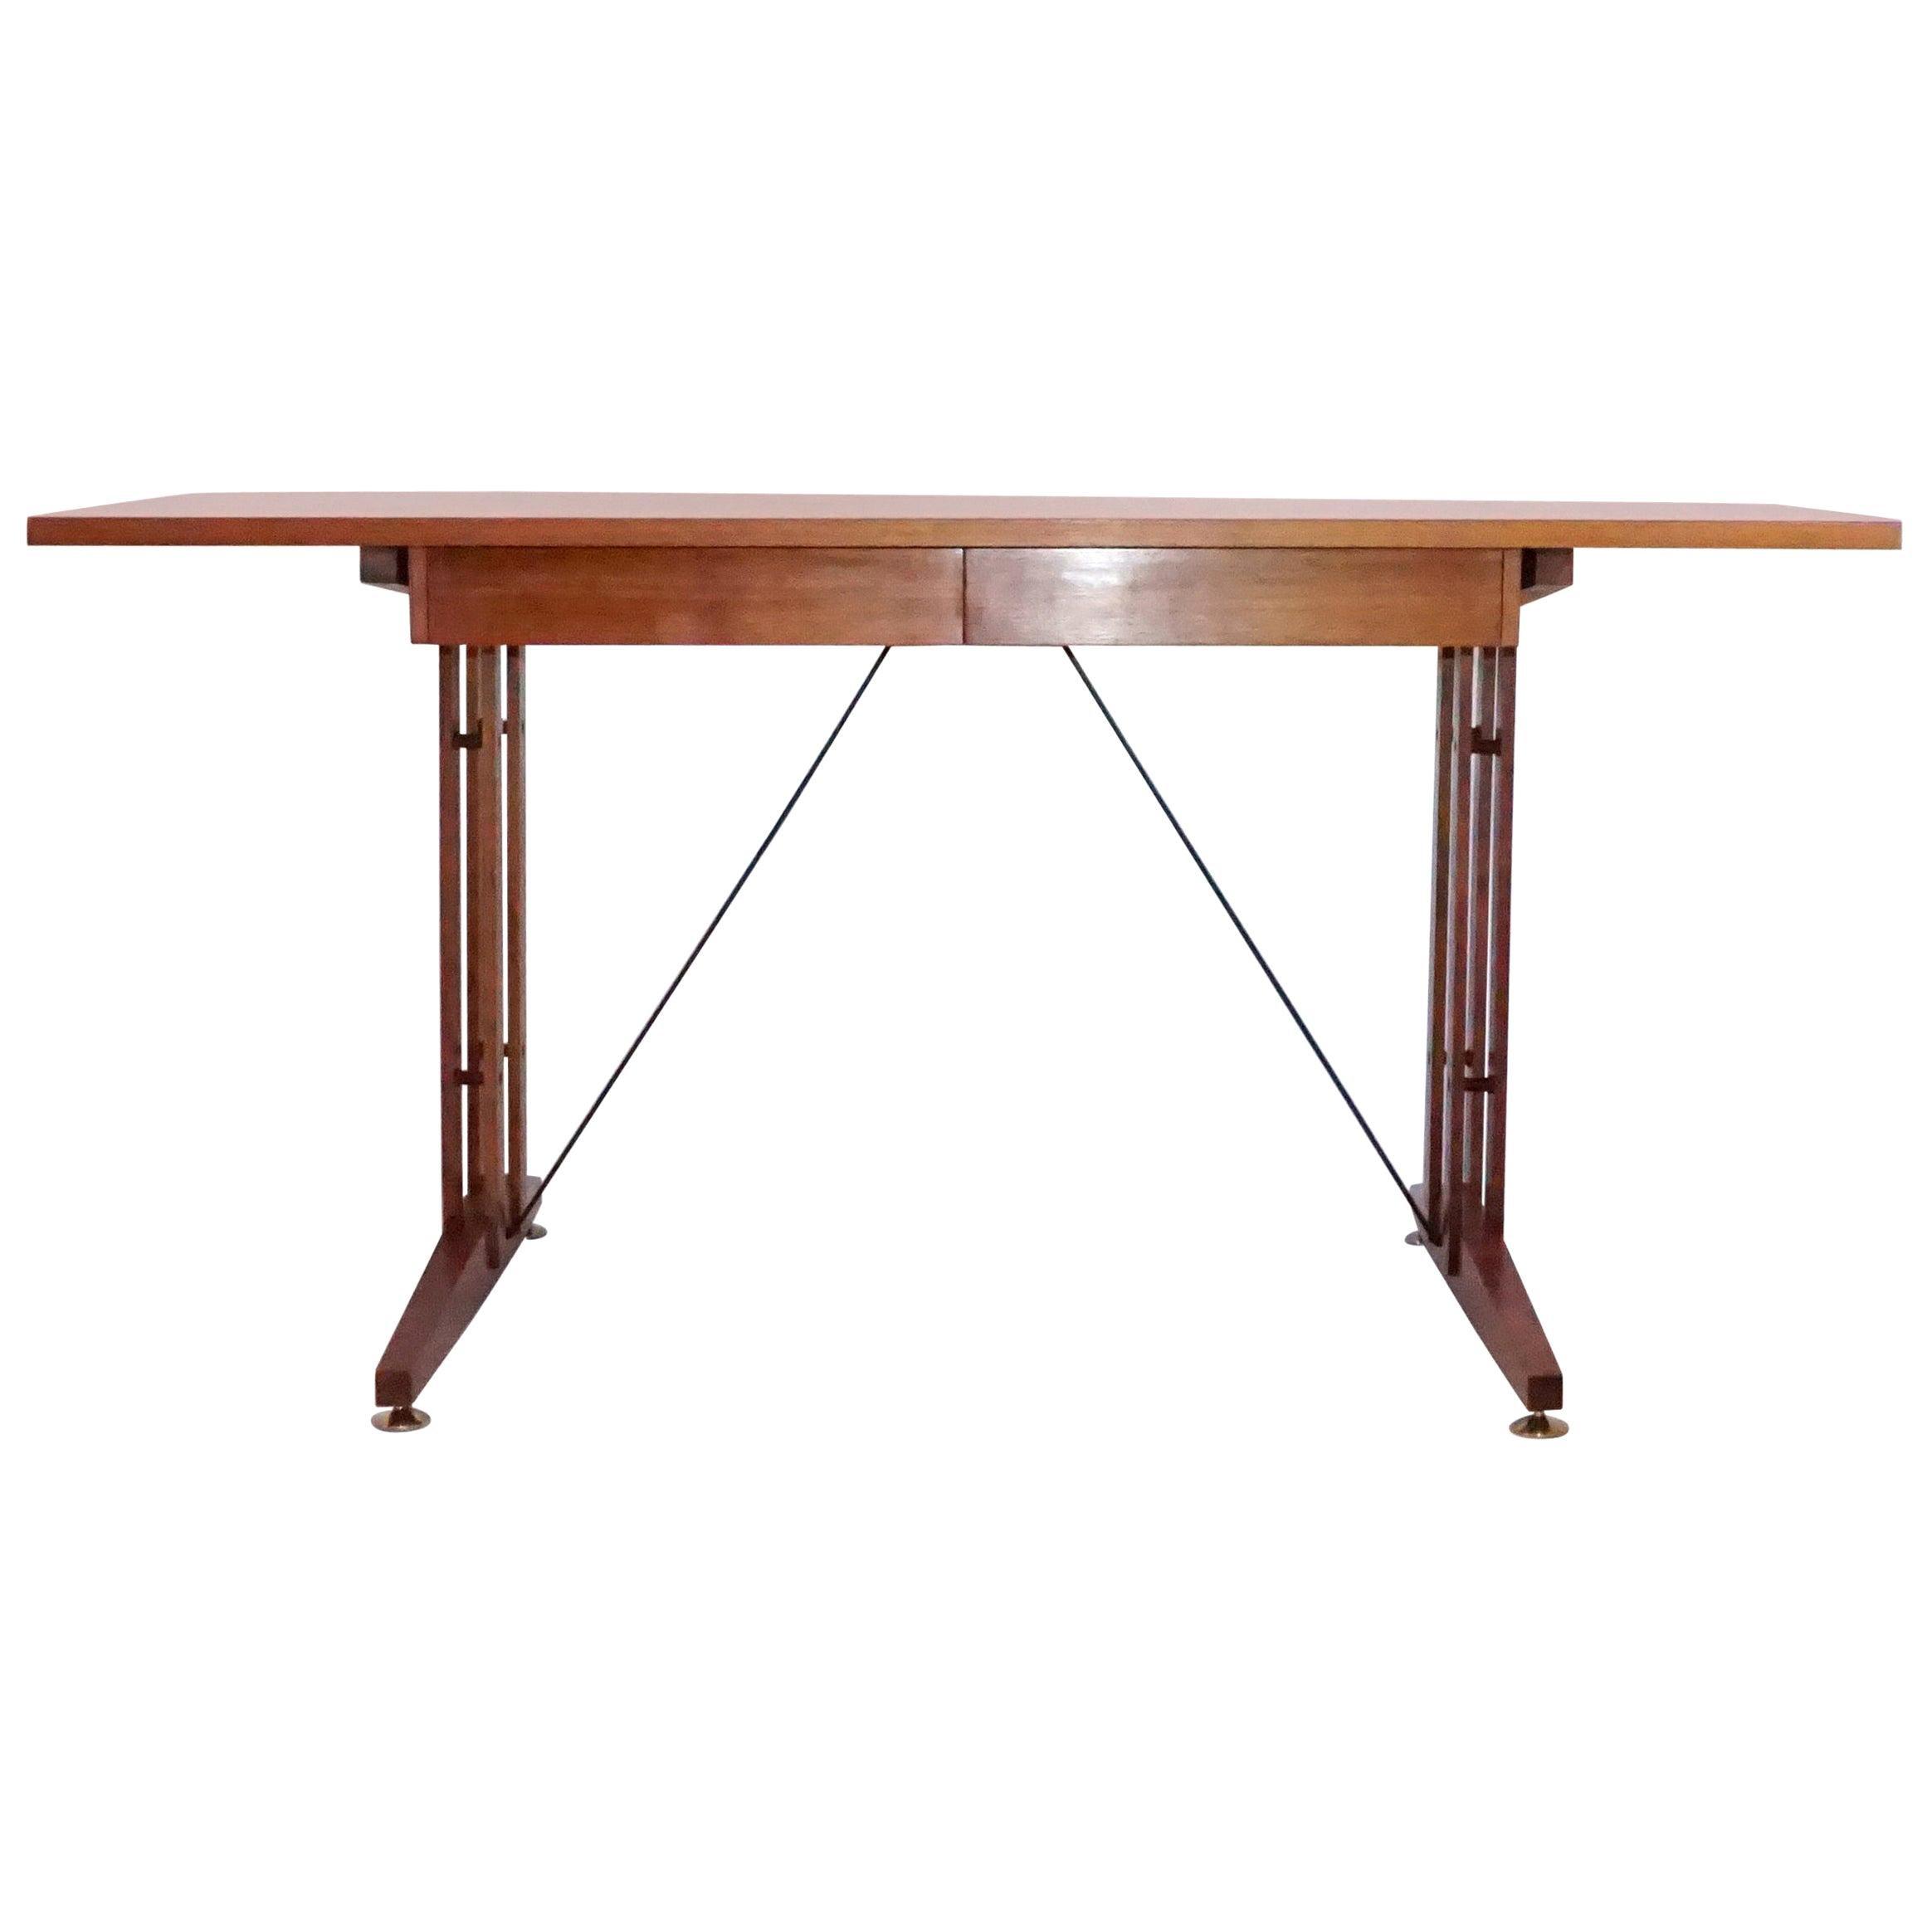 20th Century Italian Walnut Writing Table, Desk in the Manner of Carlo Ratti